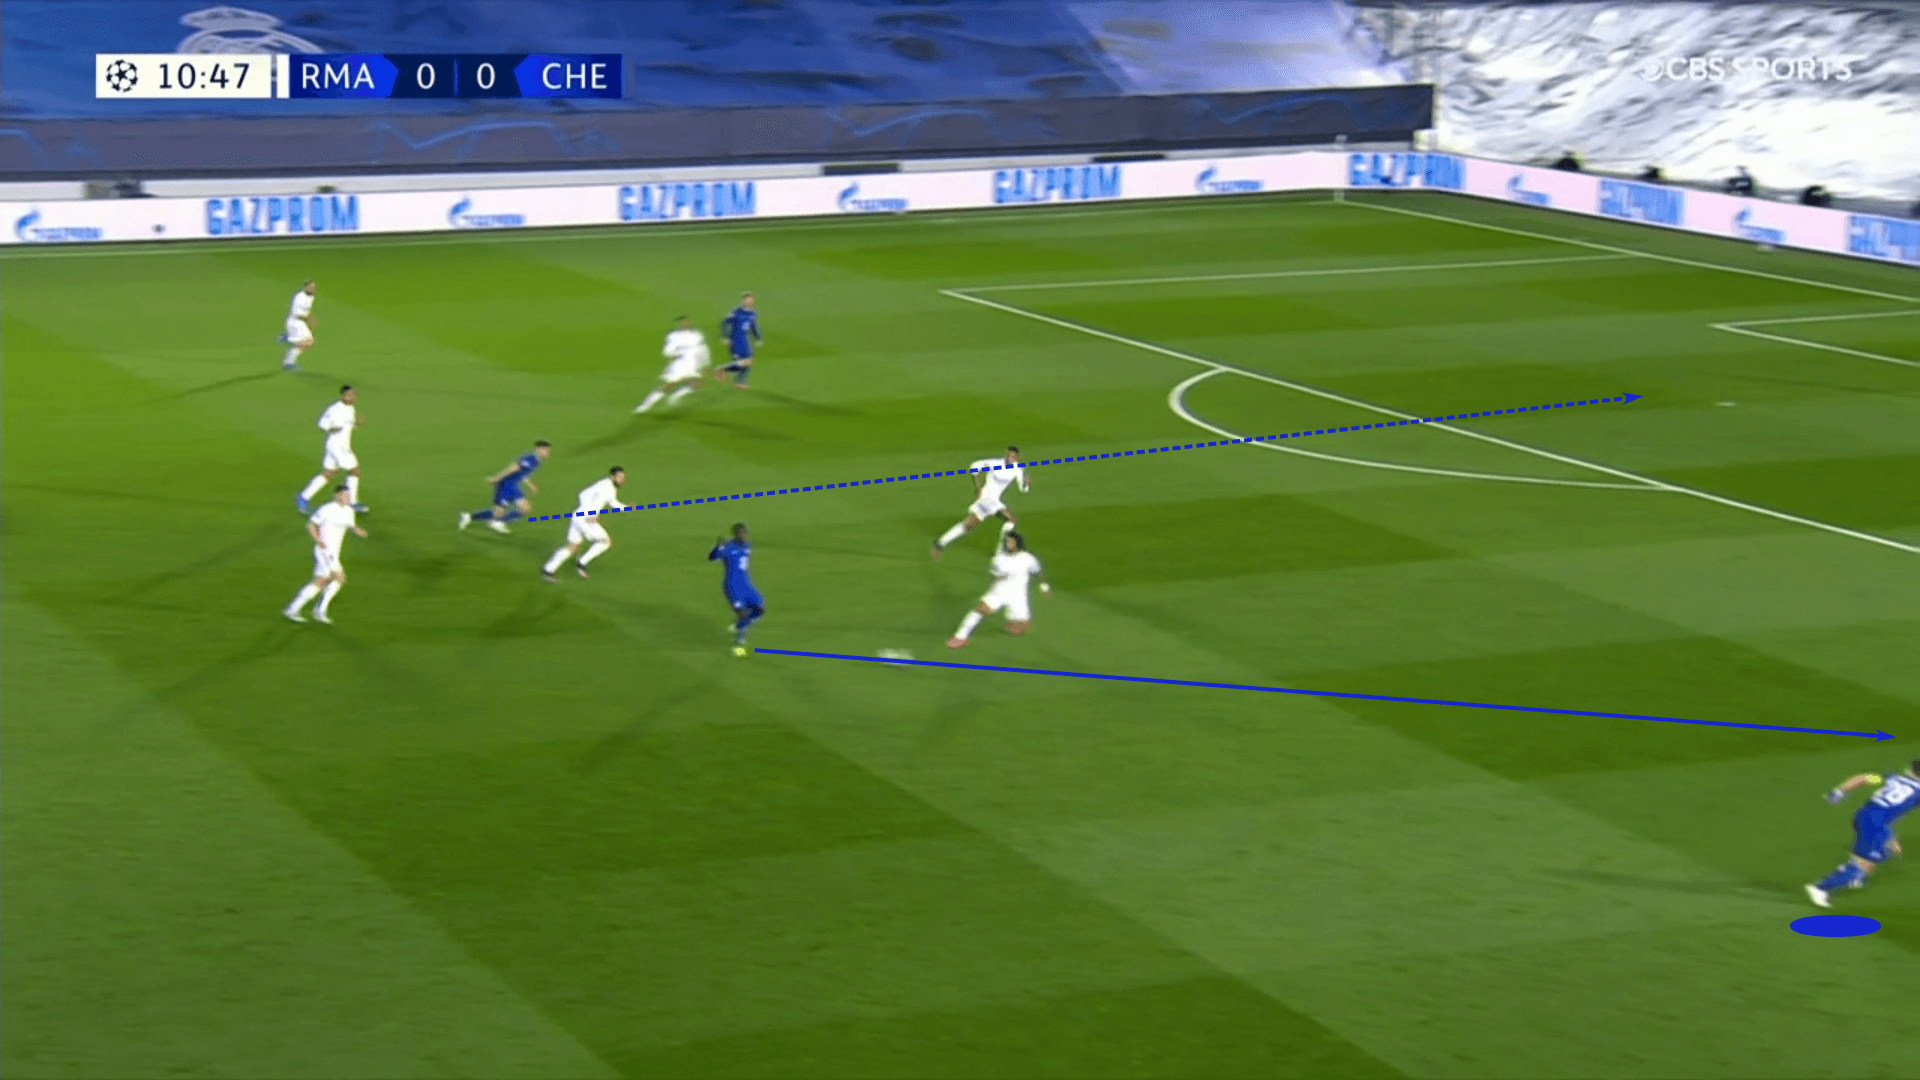 UEFA Champions League 2020/21: Chelsea vs Real Madrid – tactical preview tactics